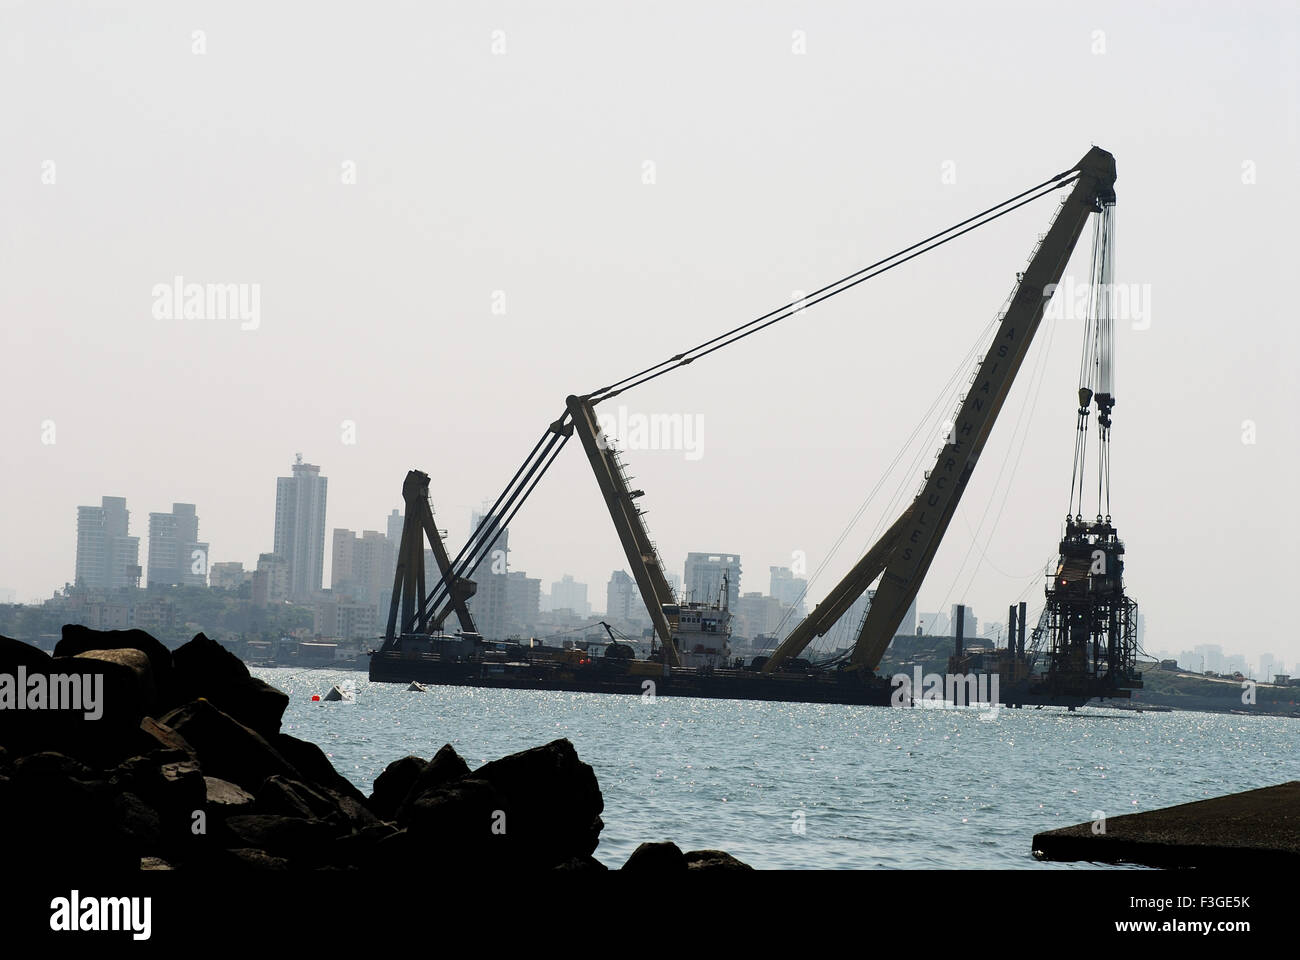 Asian Hercules 1600 Metric Tonnes Crane Carrying Load Standing in Mahim Creek ; Bandra ; Bombay Mumbai ; Maharashtra - Stock Image